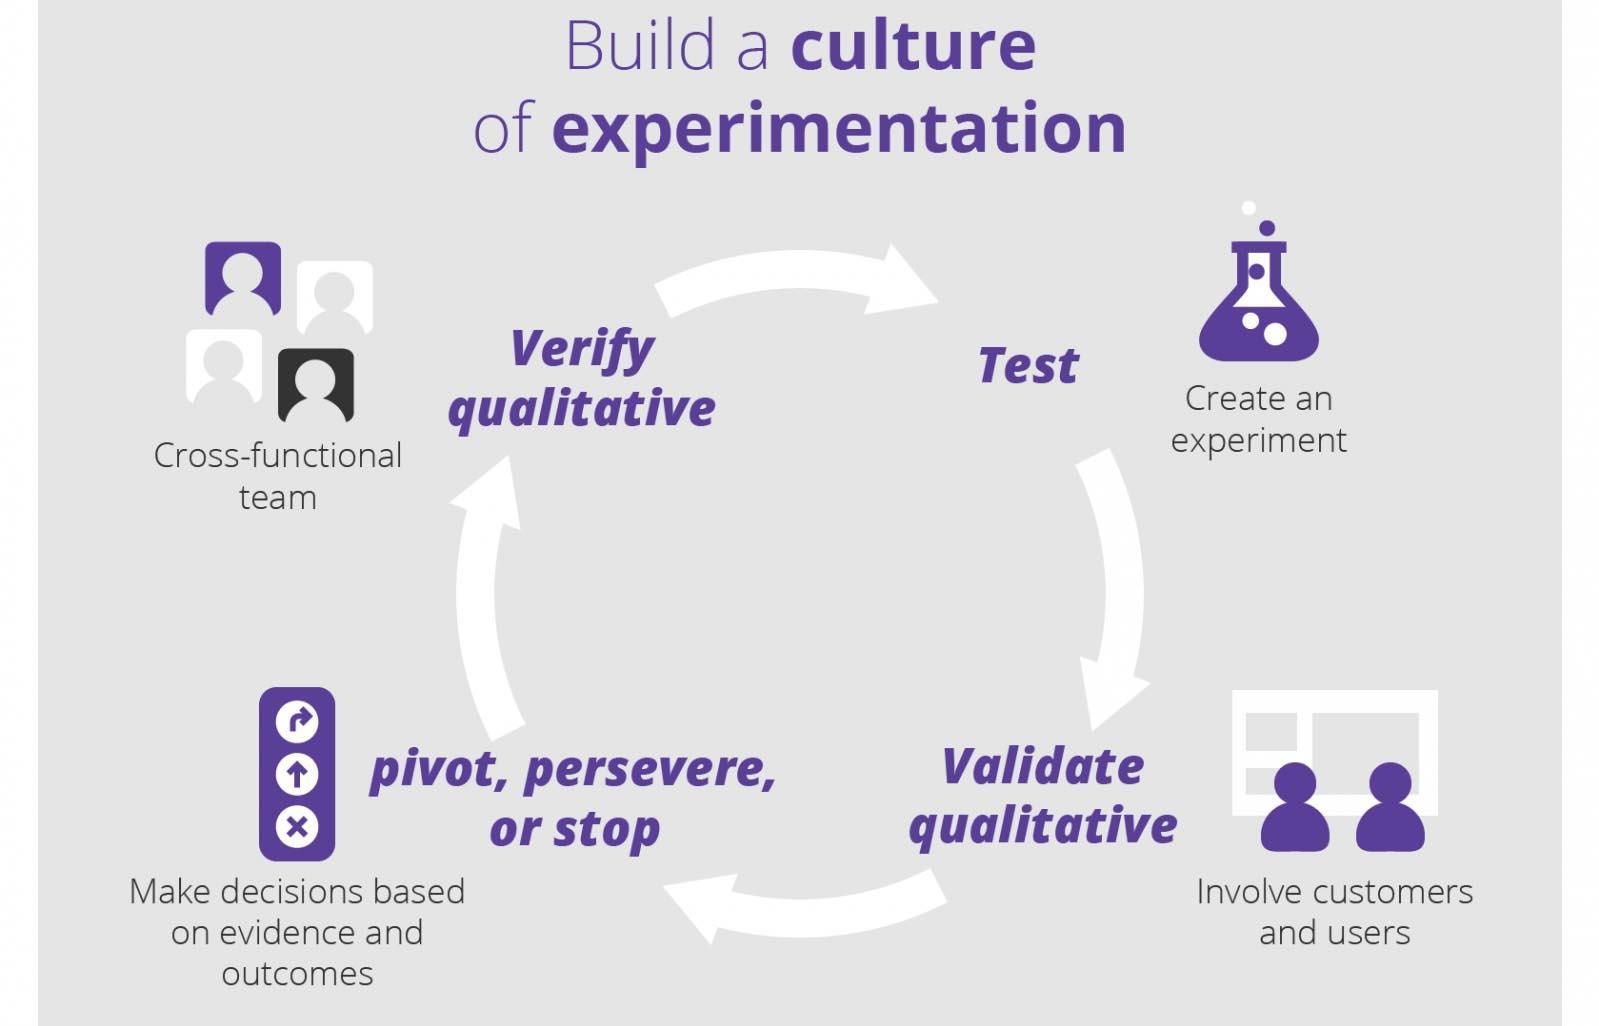 Lean Enterprise: building a culture of innovation: verify qualitative, test, validate qualitative, pivot, persevere or stop